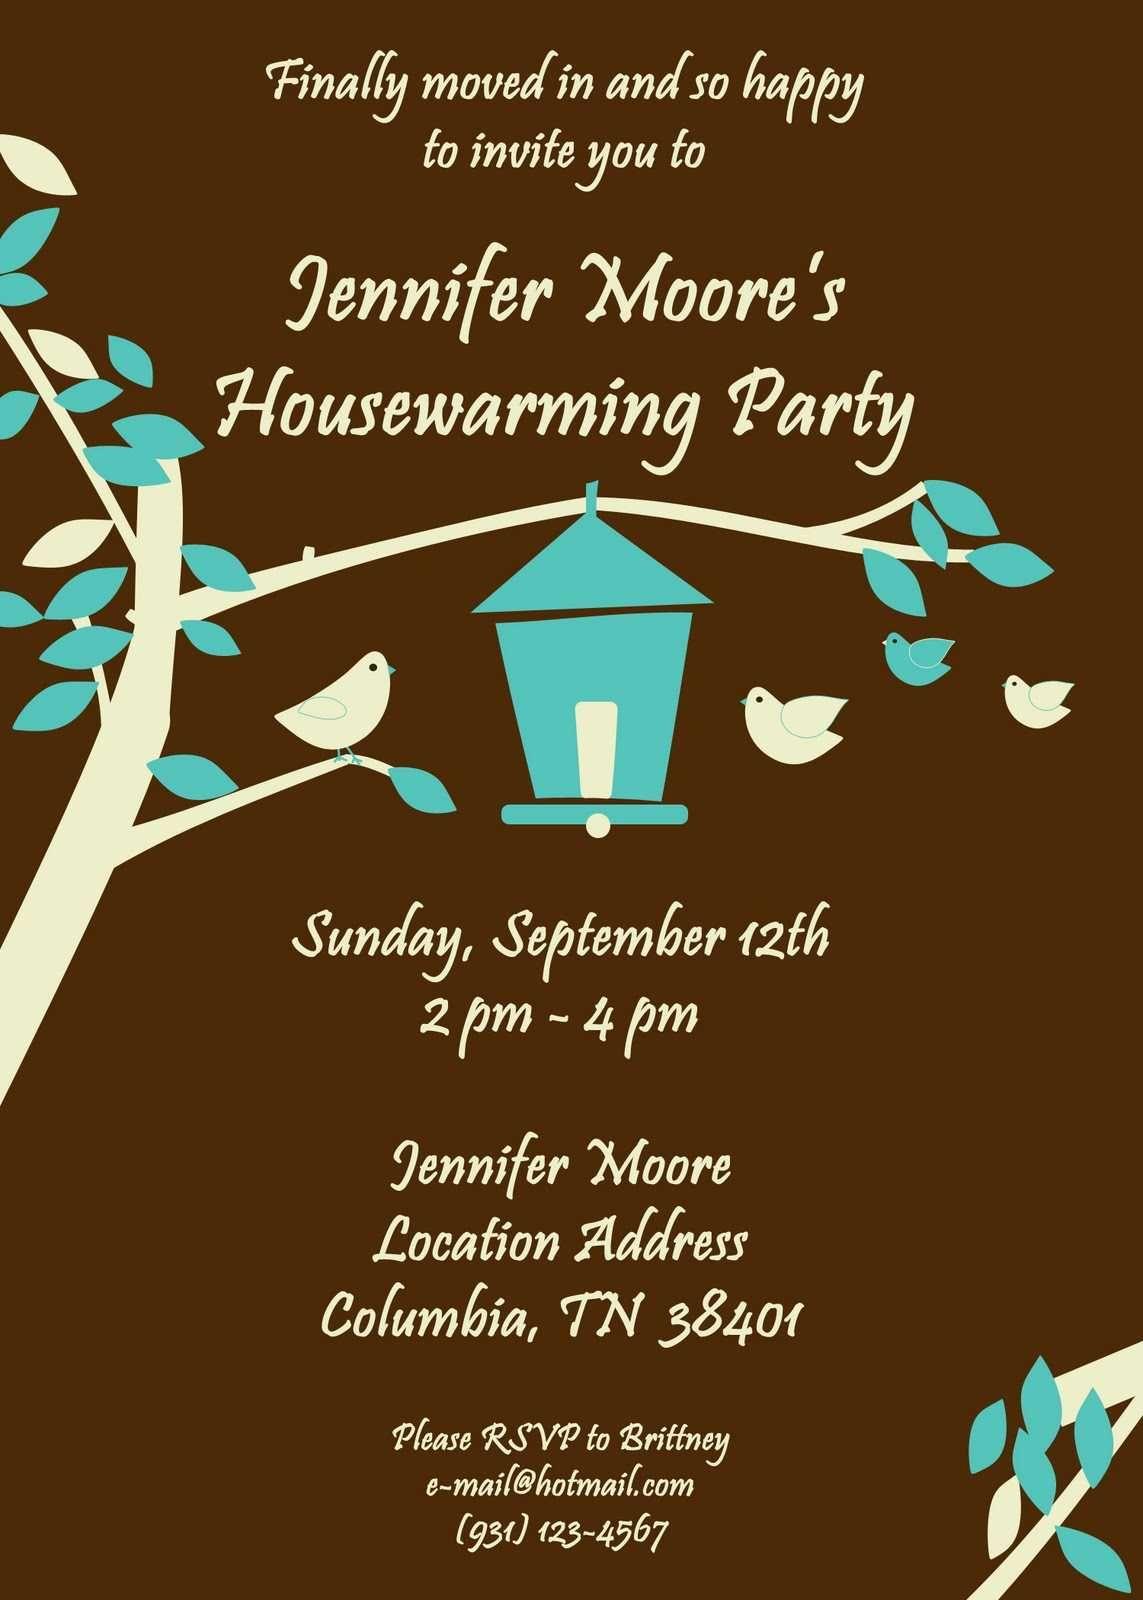 Housewarming Party Invitations Cute Birdhouse Theme Anna & Randy